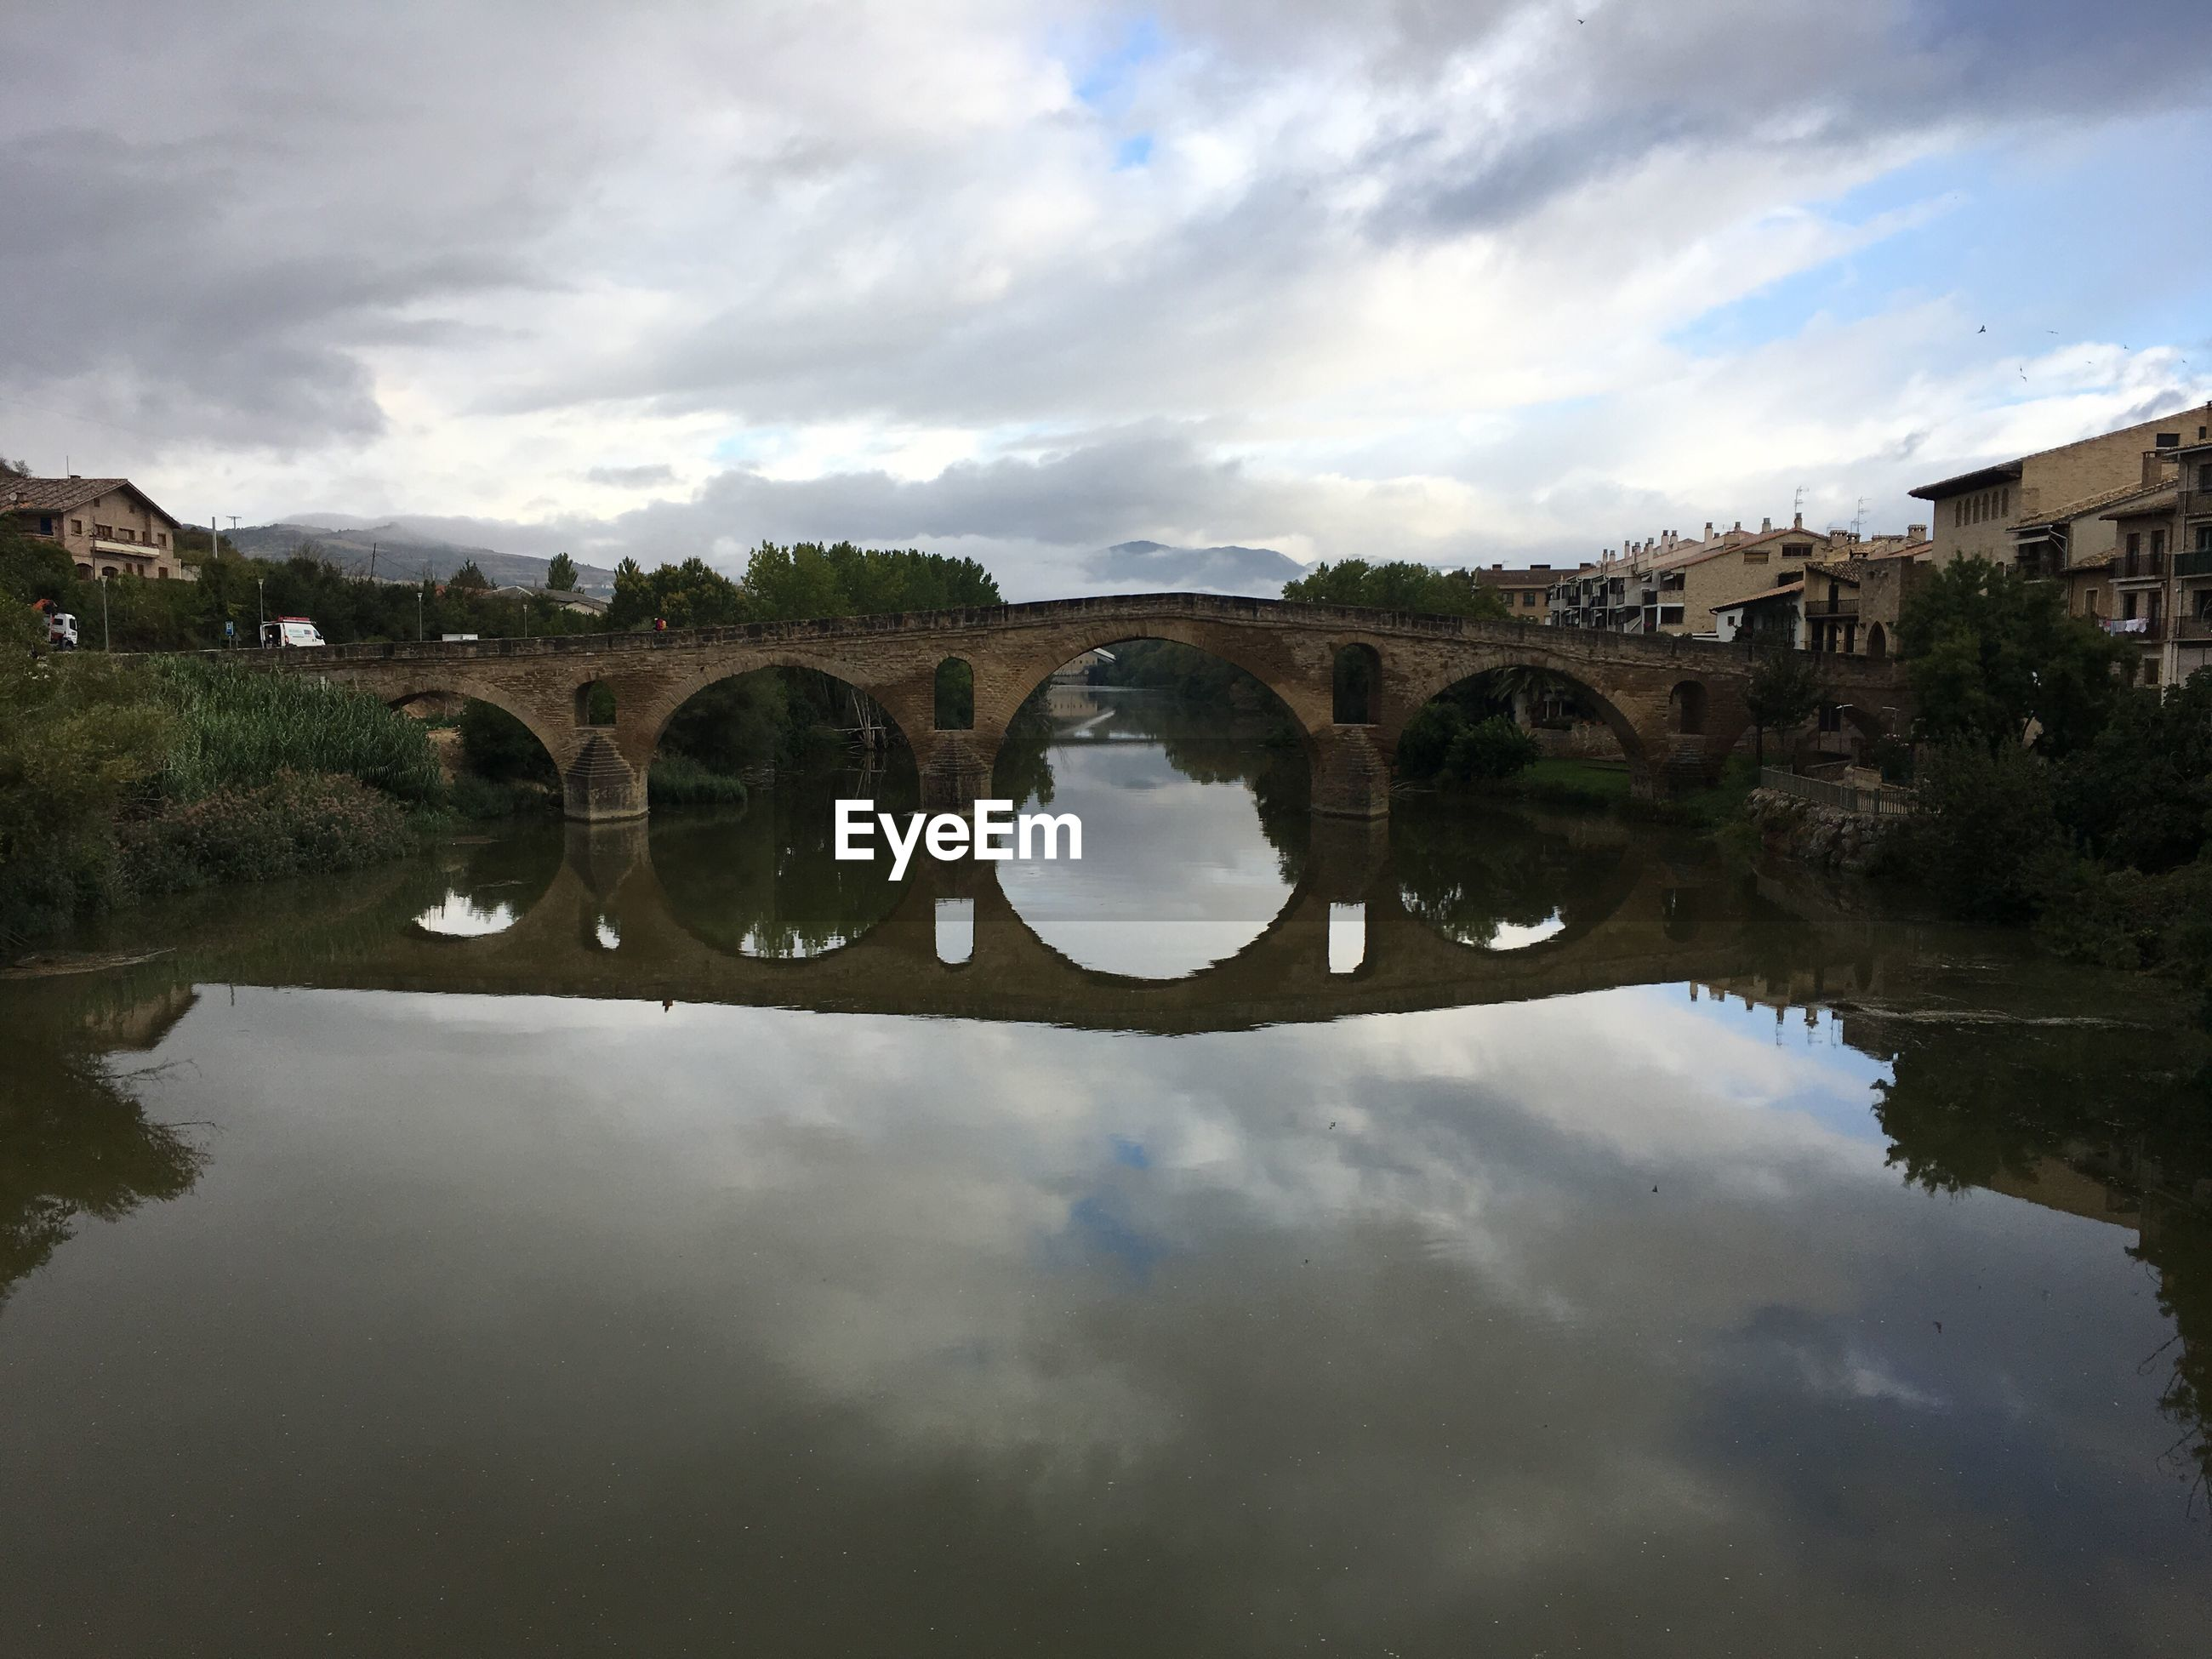 REFLECTION OF BRIDGE ON WATER